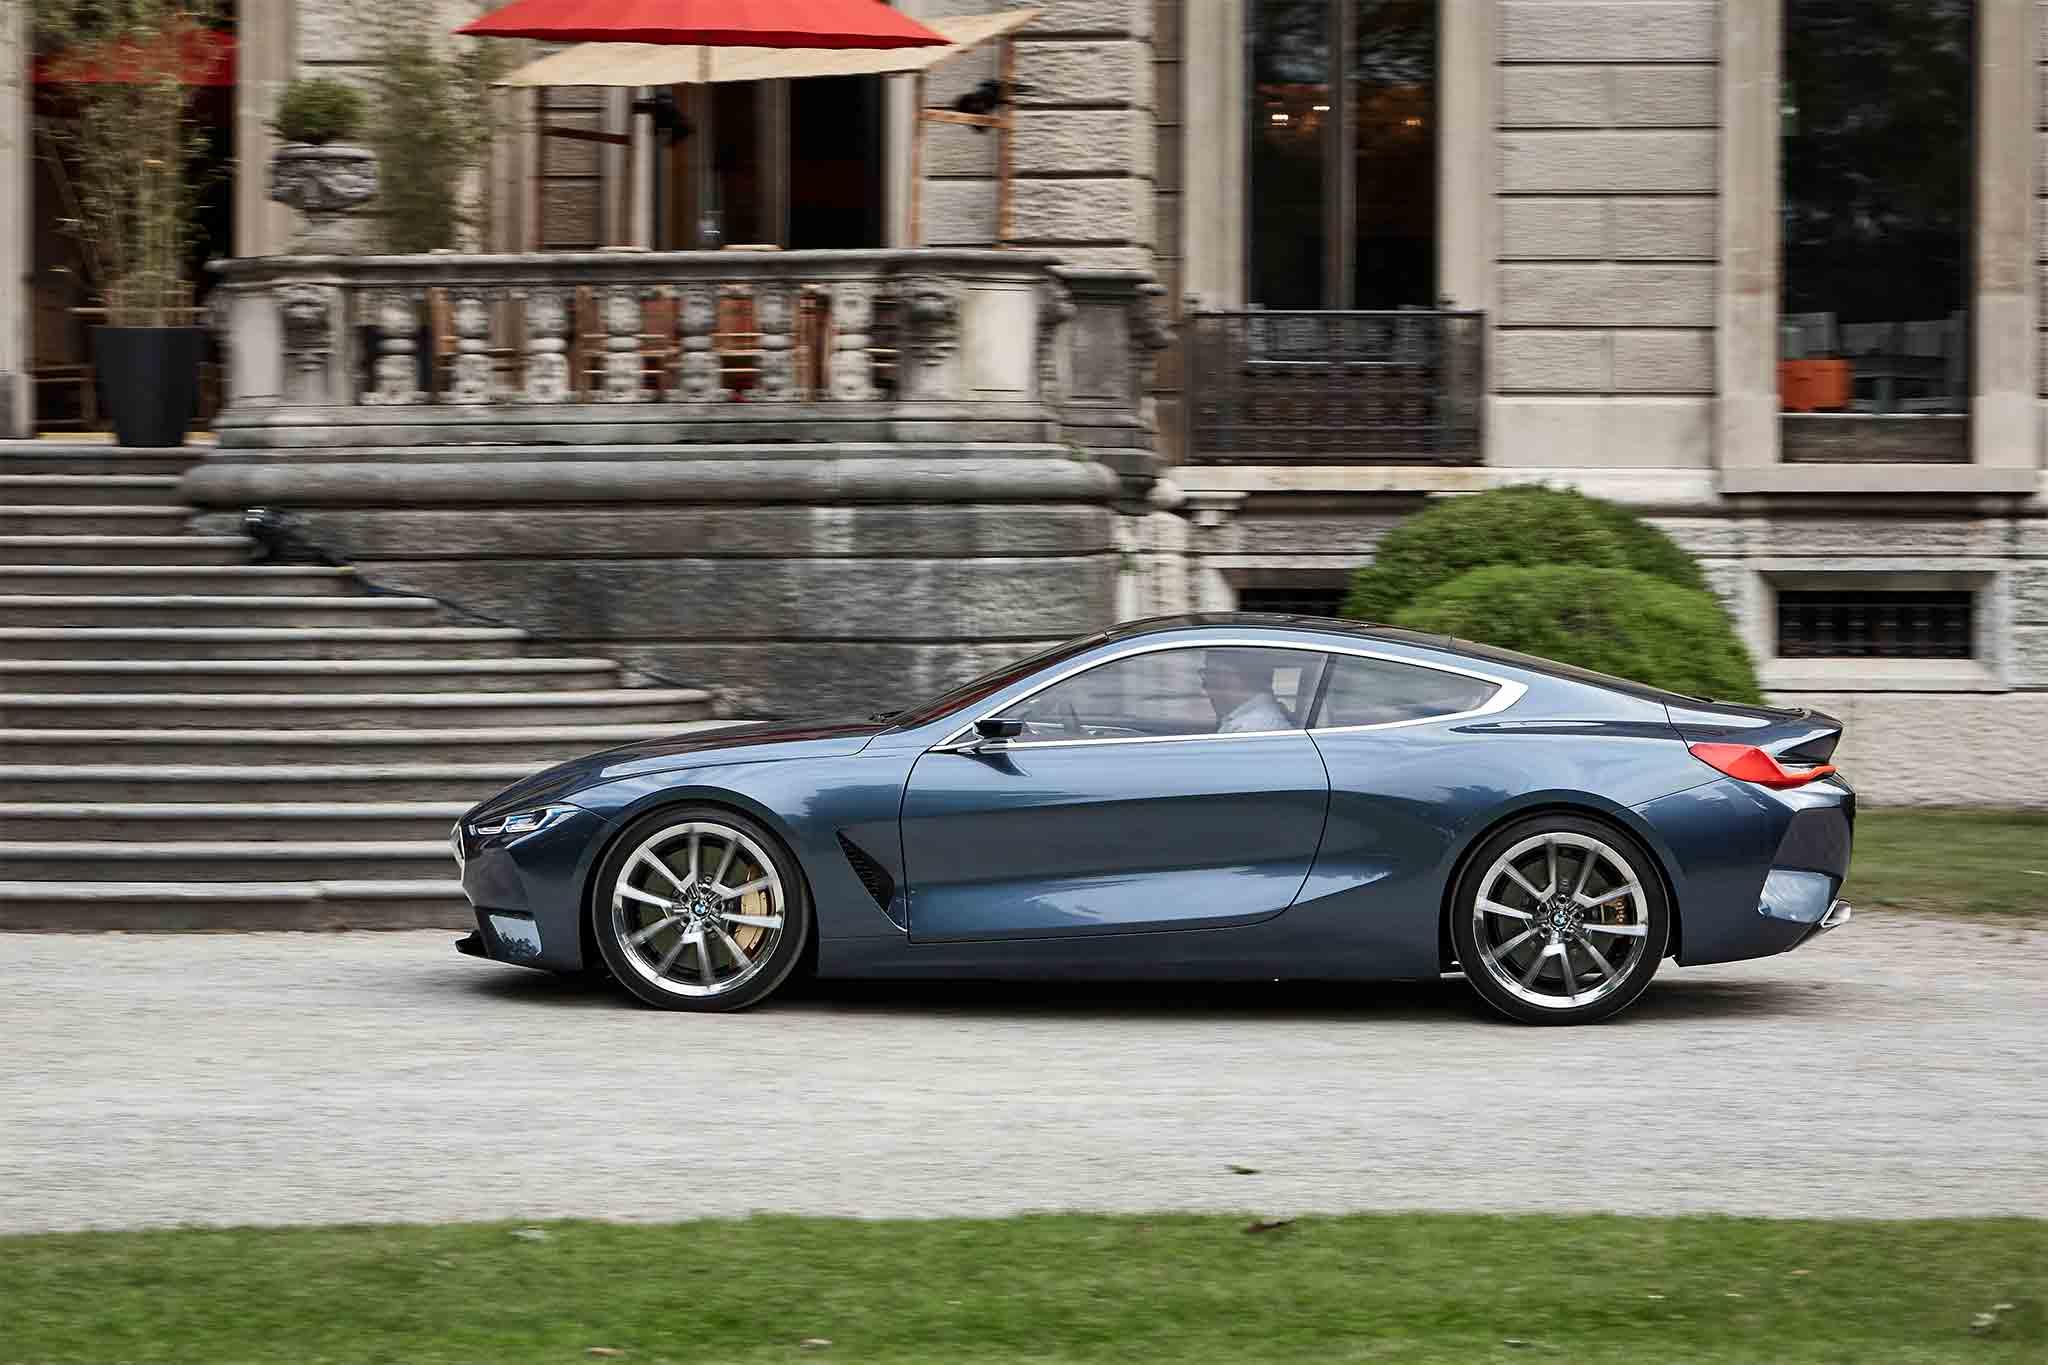 Exclusive BMW Series Concept Quick Drive Move Ten Manual Shift - 8 series bmw